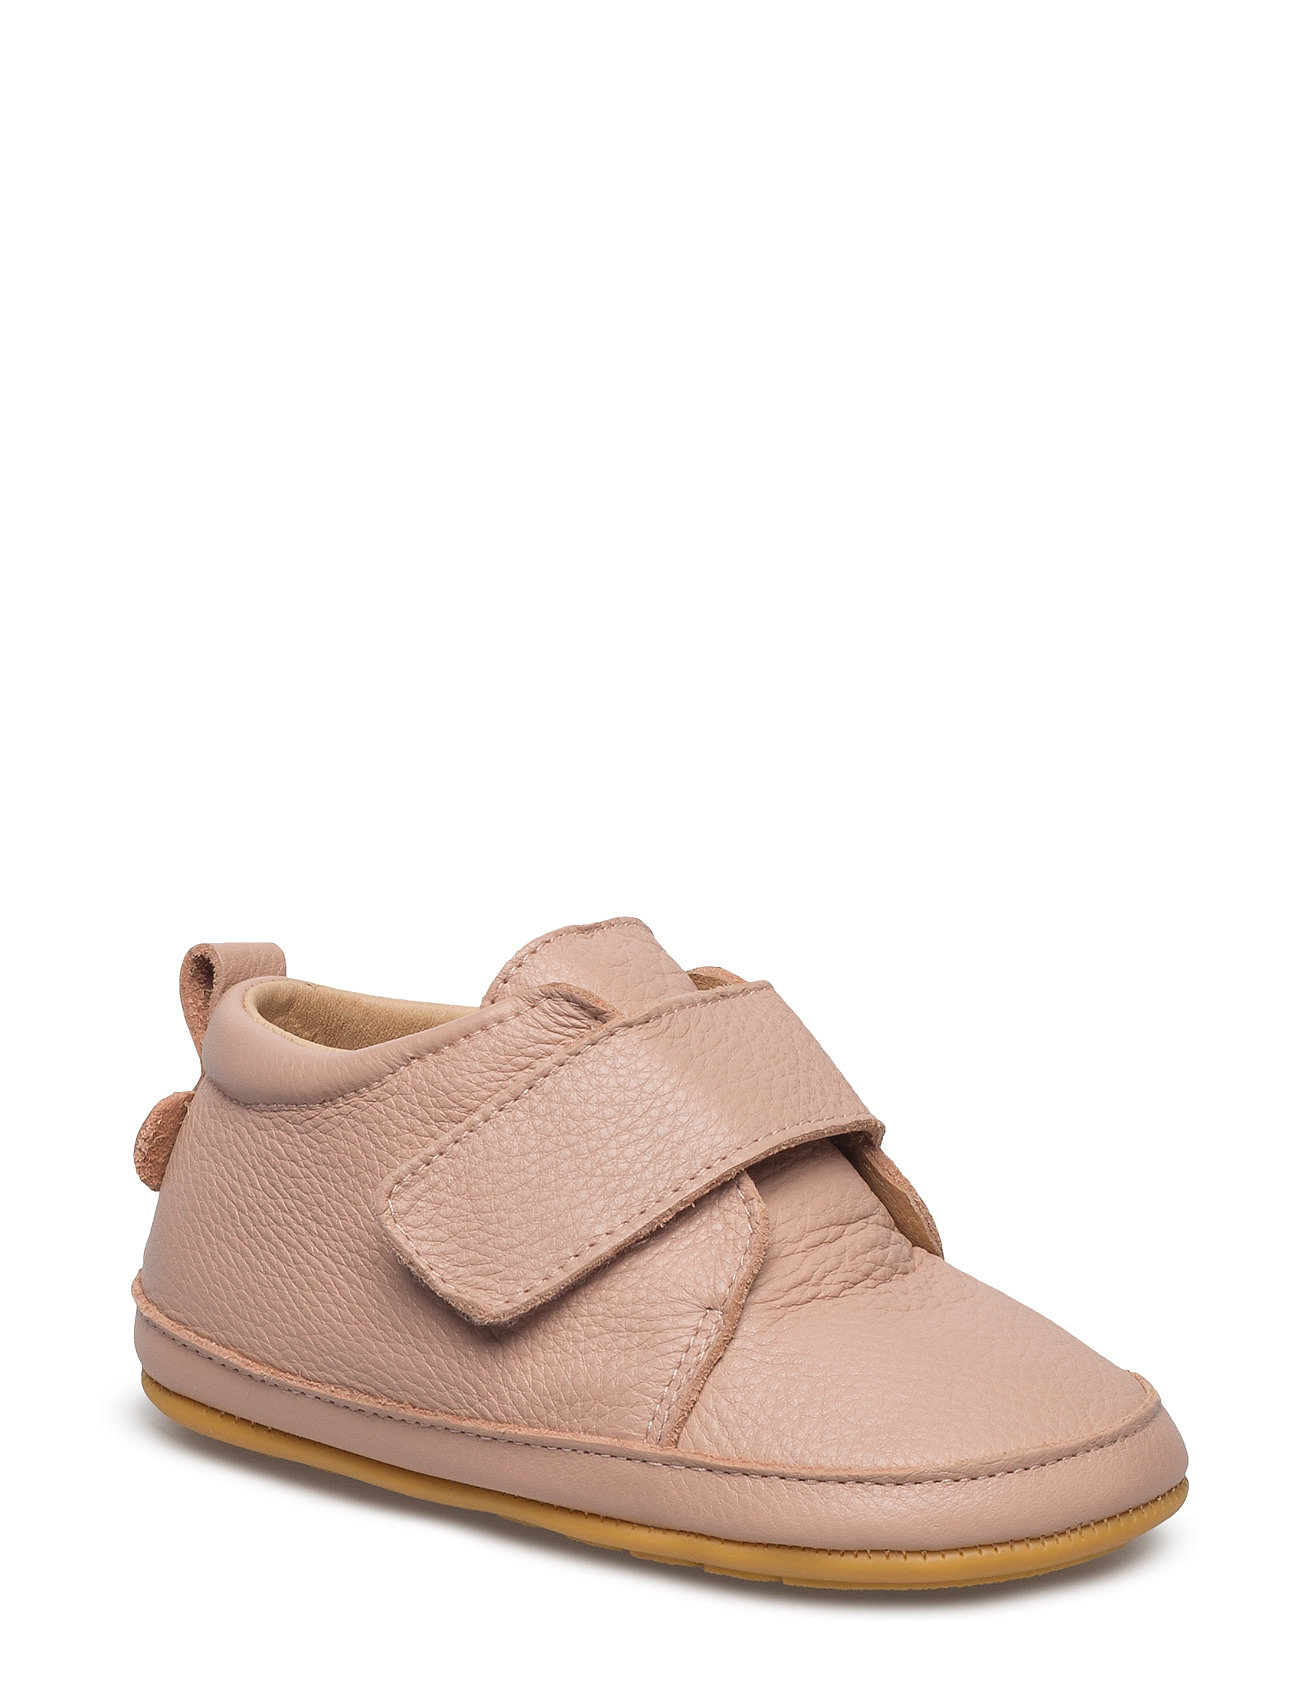 748f942d2305 Prewalker - Velcro With Toecap Move by Melton Sko   Sneakers til Børn i